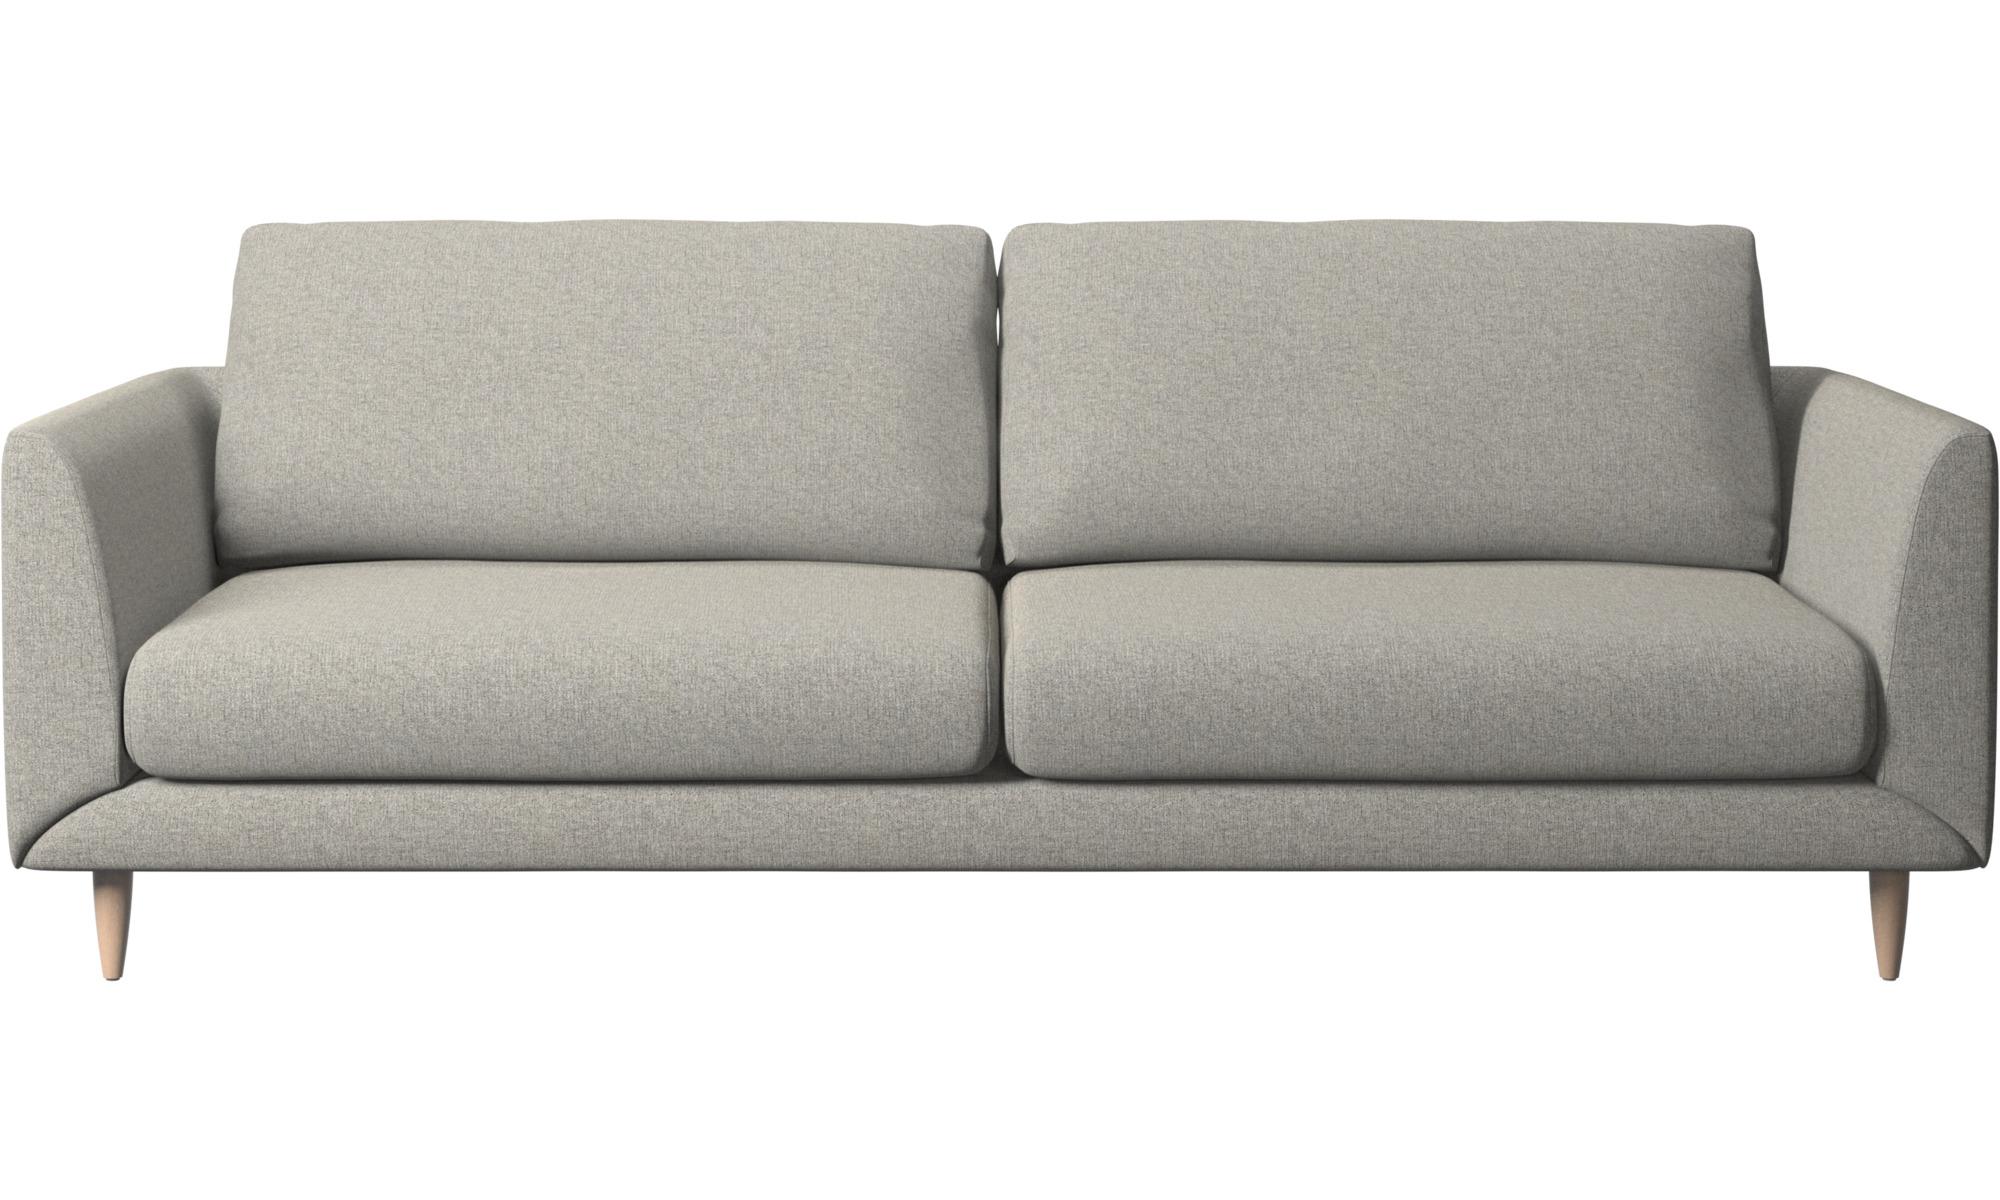 3 sitzer sofas fargo sofa boconcept. Black Bedroom Furniture Sets. Home Design Ideas